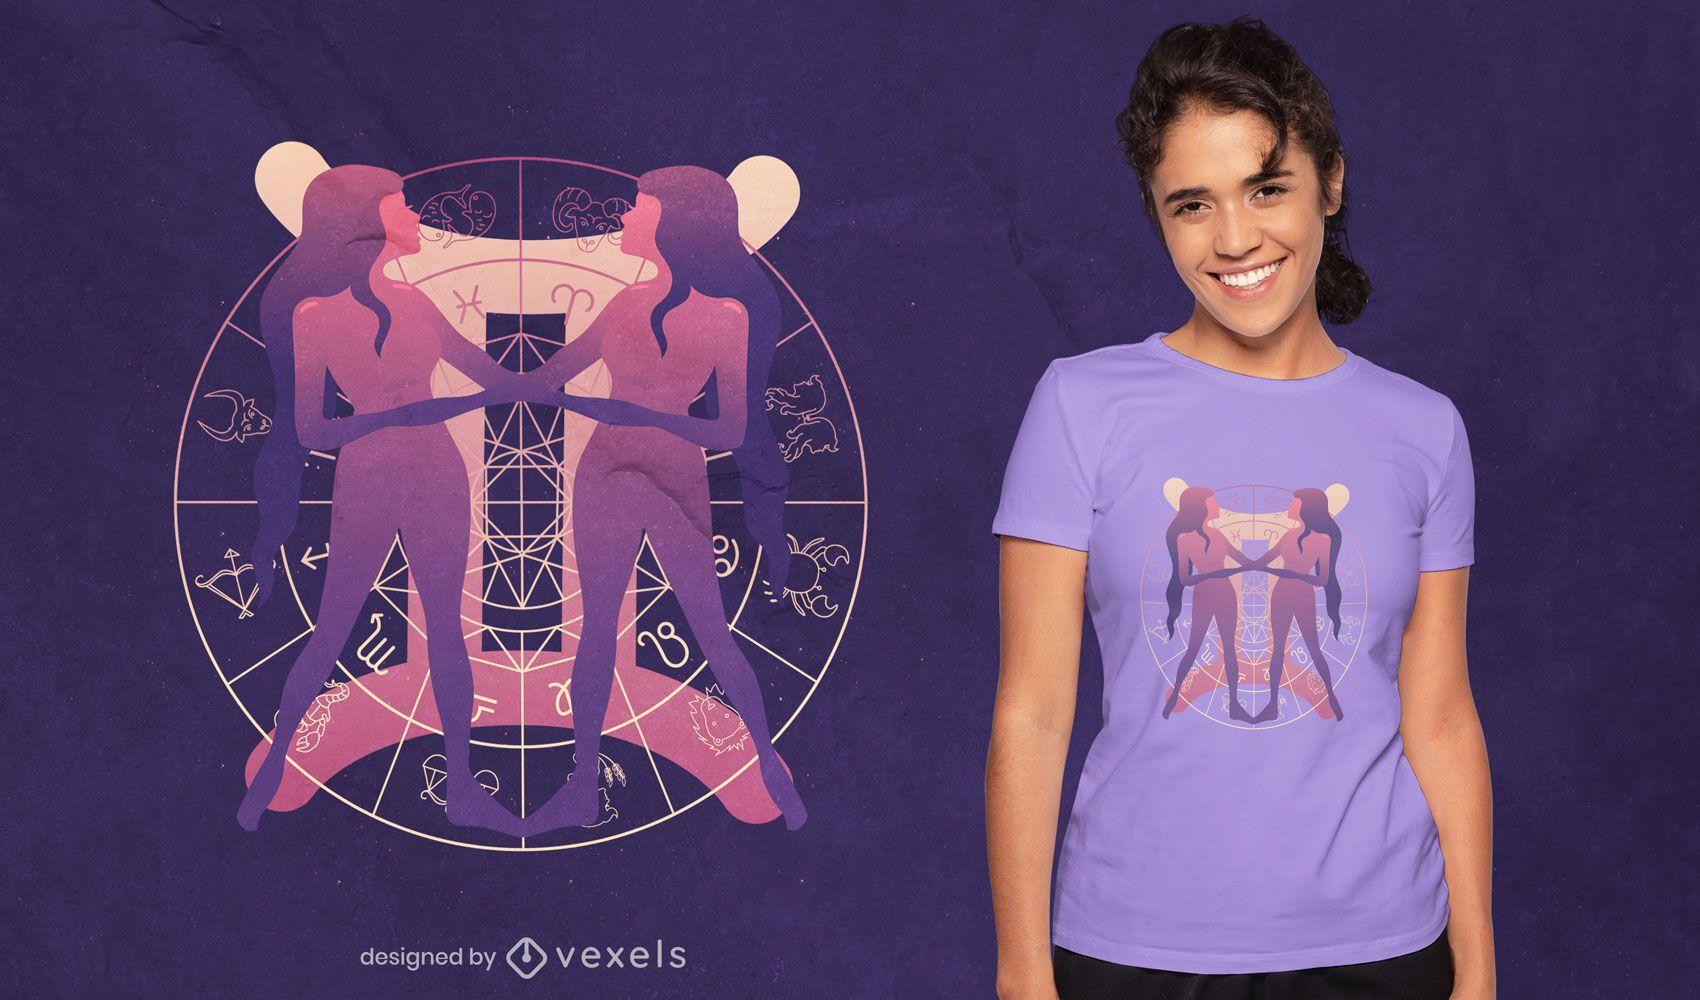 Diseño de camiseta con degradado del símbolo del zodiaco Géminis